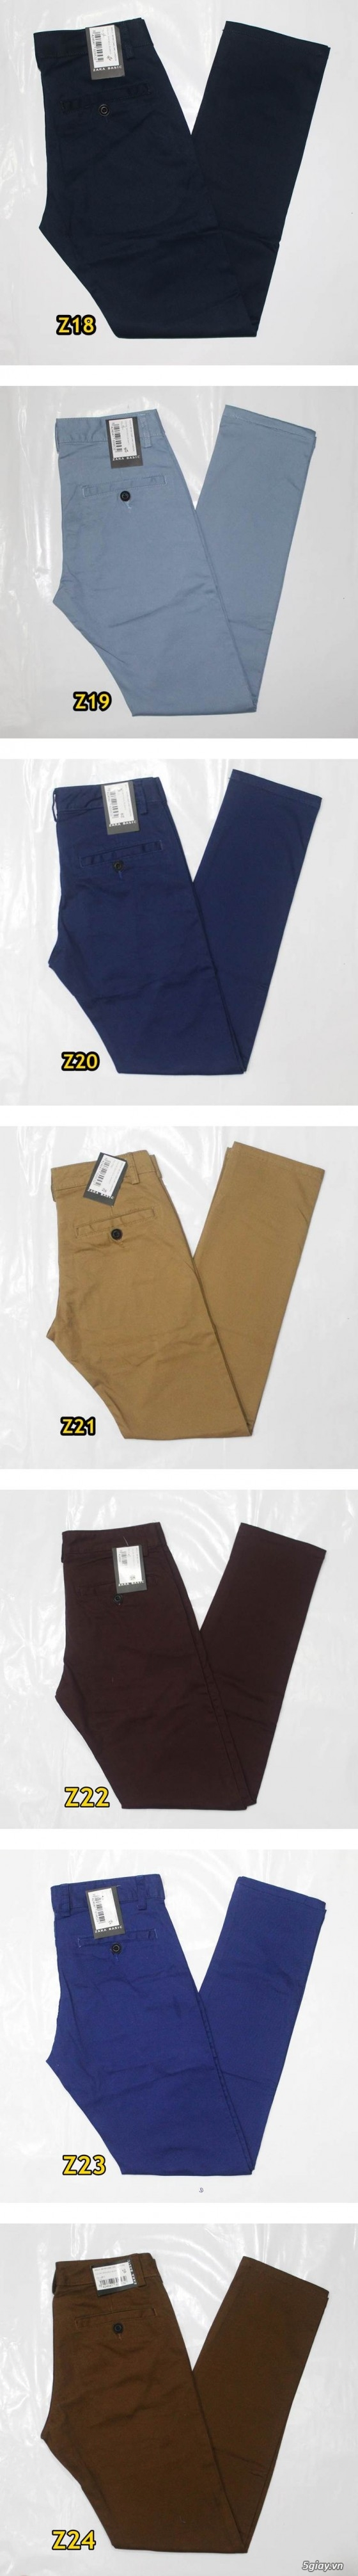 Quần kaki ZARA SlimFit,quần jean Levi's 511 SlimFit,quần short SuperDry,short jean CK - 41